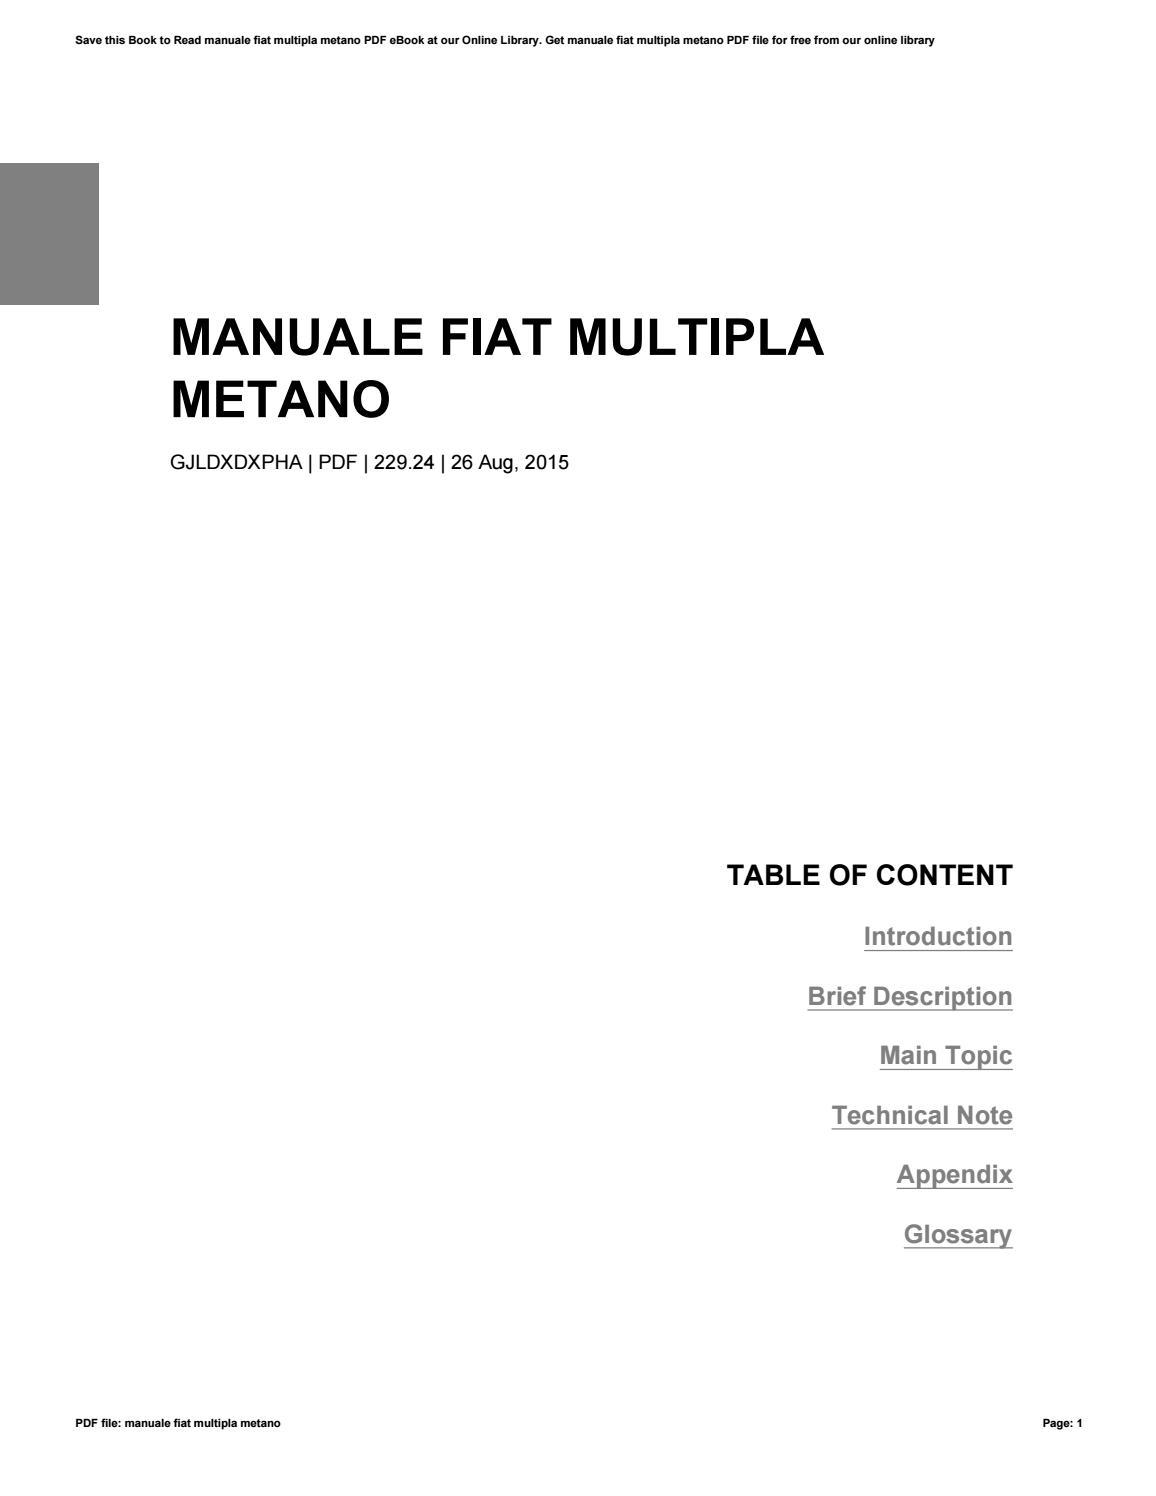 manuale fiat tipo ebook